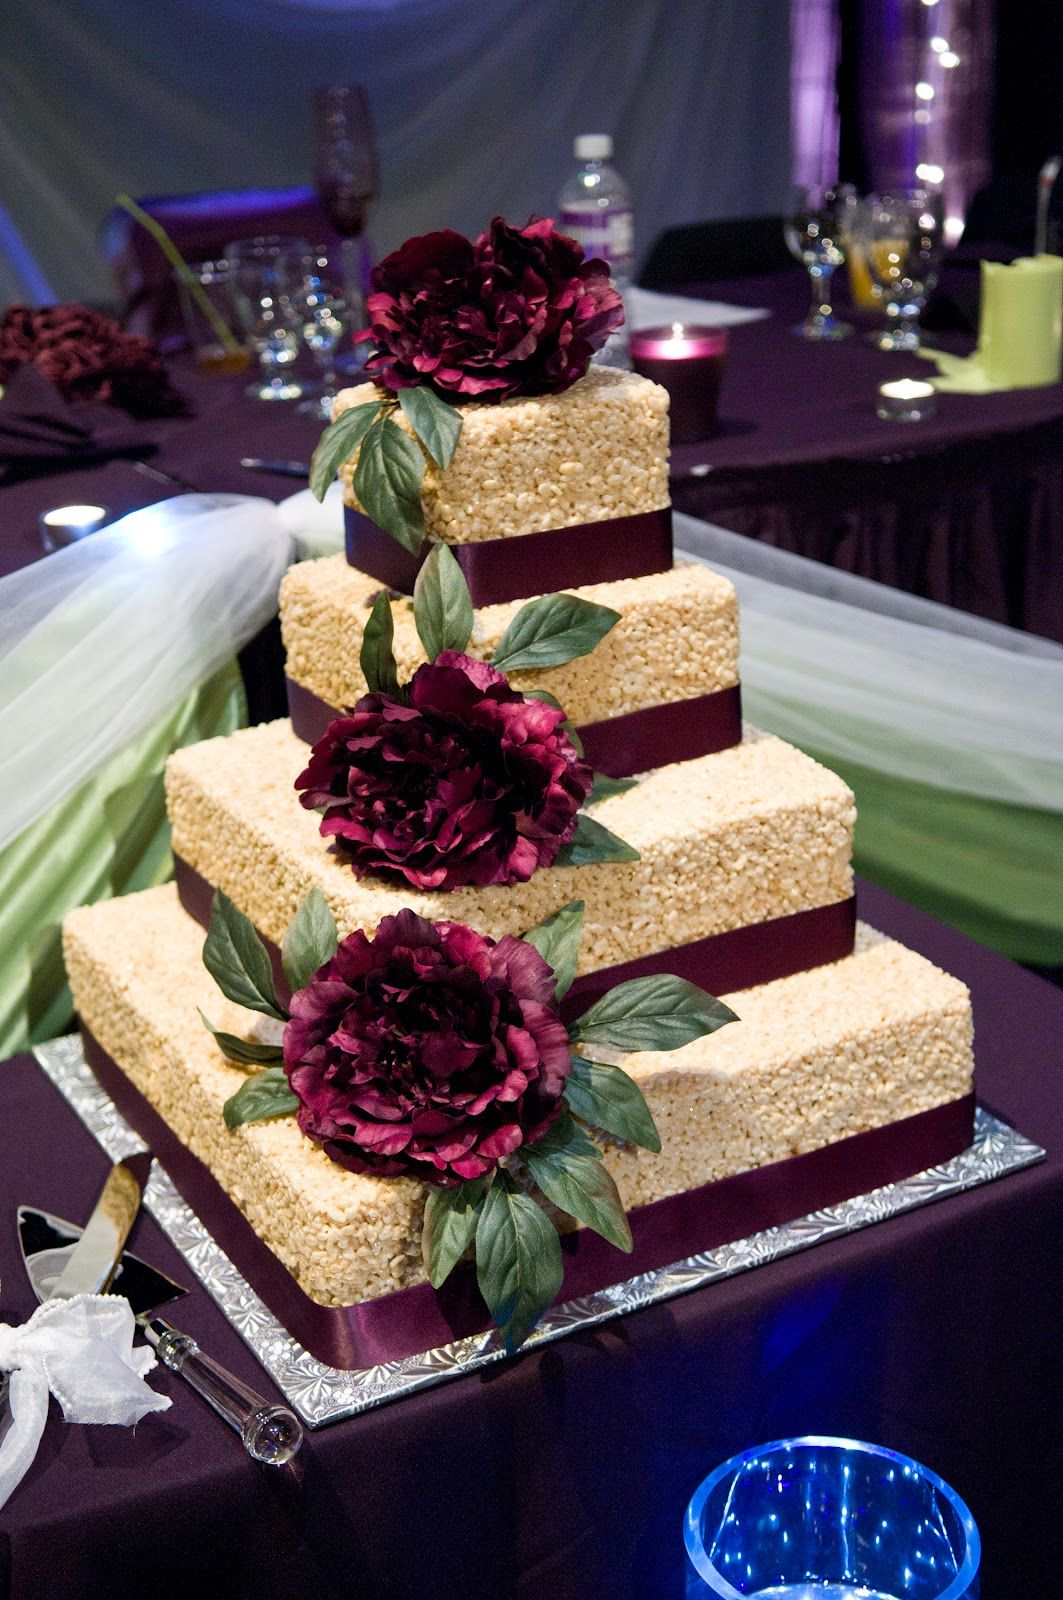 this my kinda cake rice krispie wedding cake wow cakes desserts sweet snacks. Black Bedroom Furniture Sets. Home Design Ideas